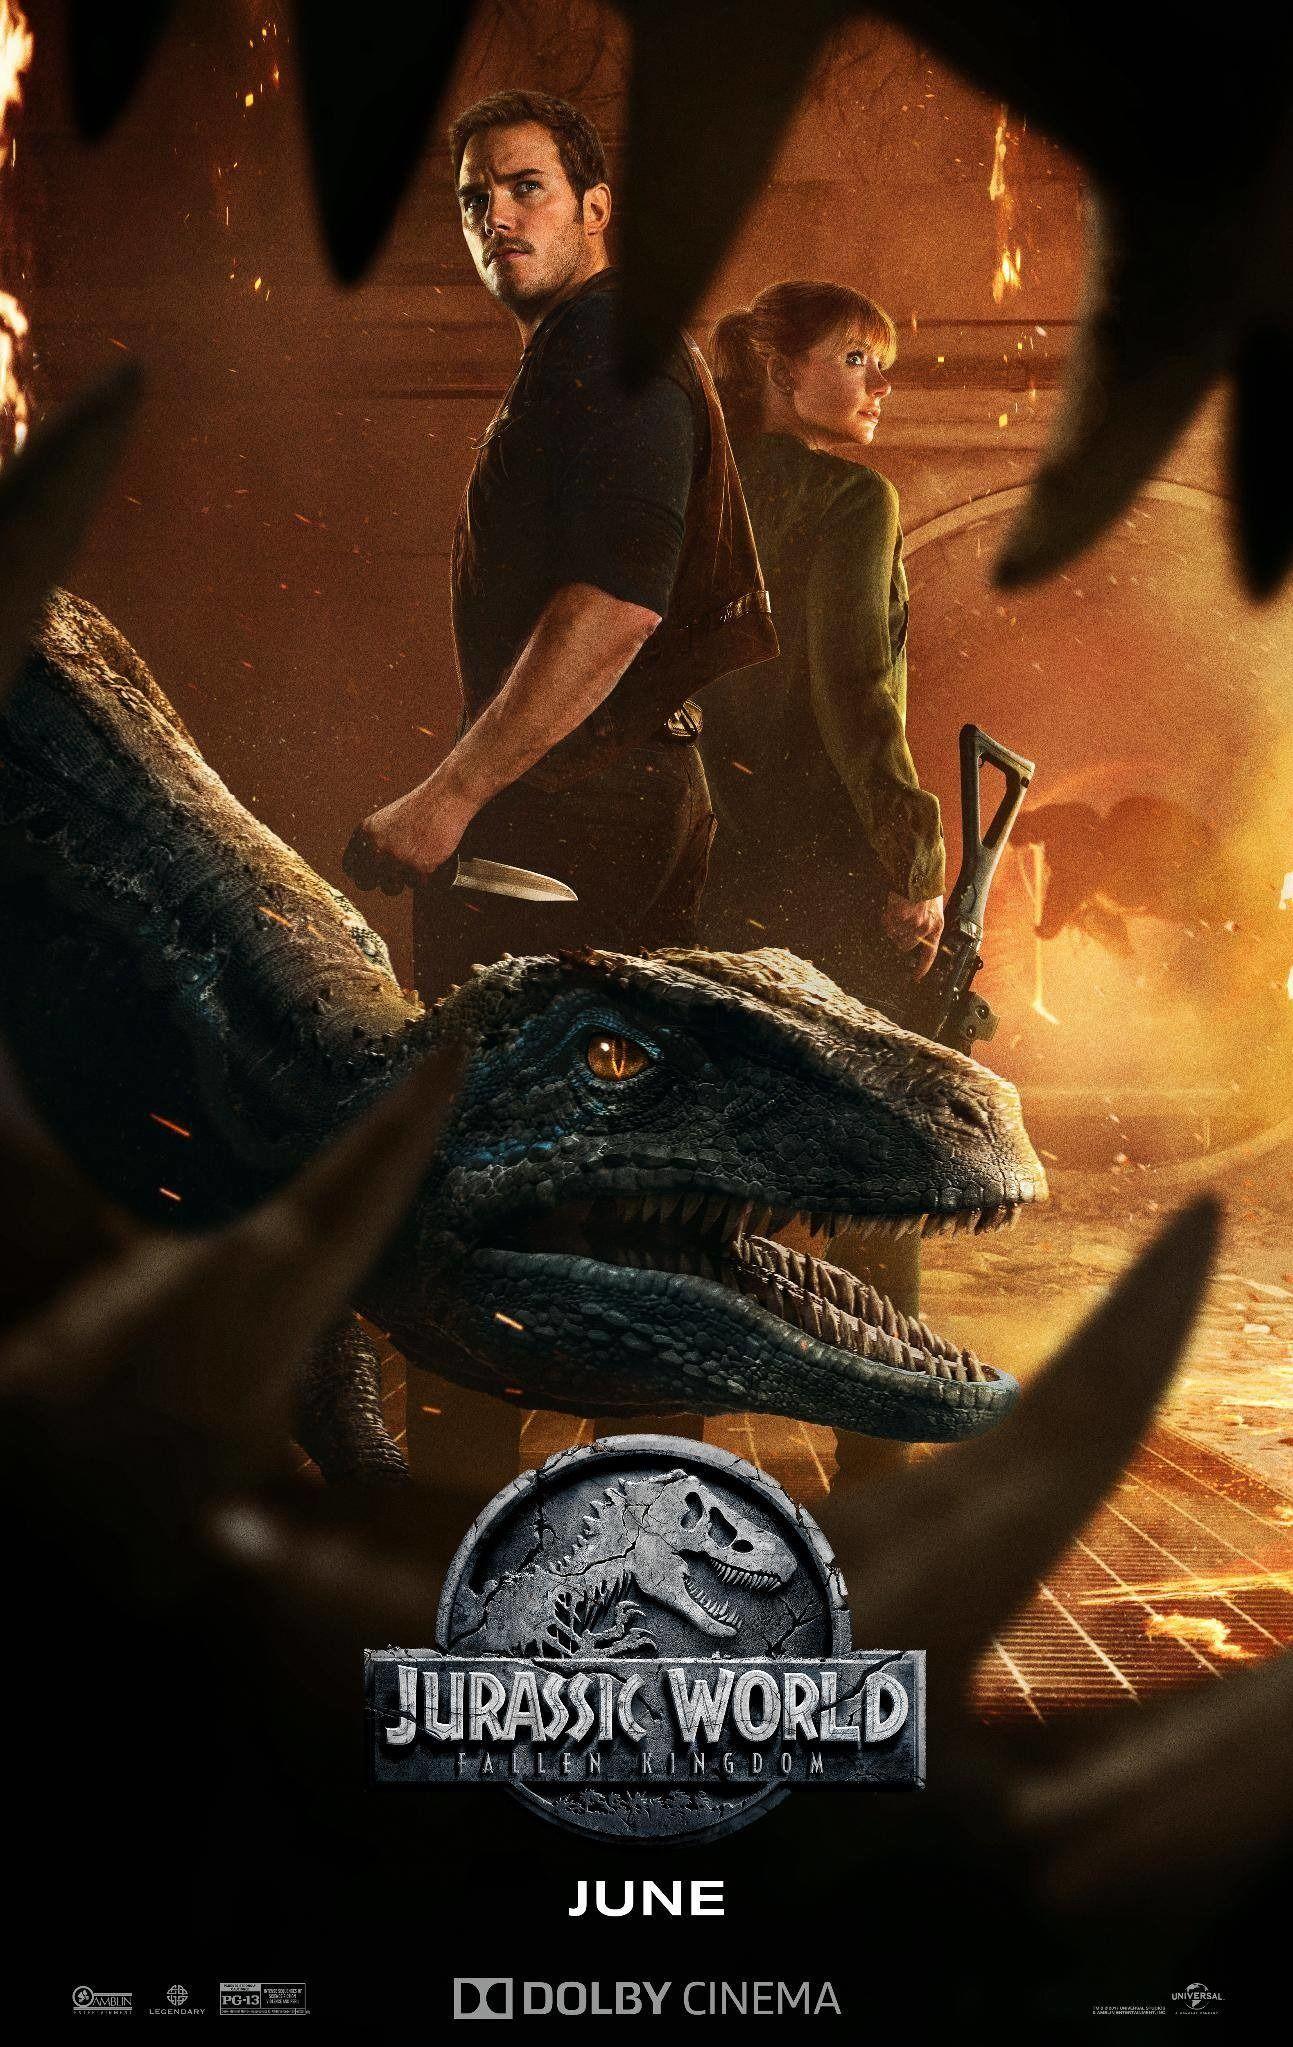 Return To The Main Poster Page For Jurassic World Fallen Kingdom 8 Of 8 Jurassic World Wallpaper Jurassic World Jurassic World Poster